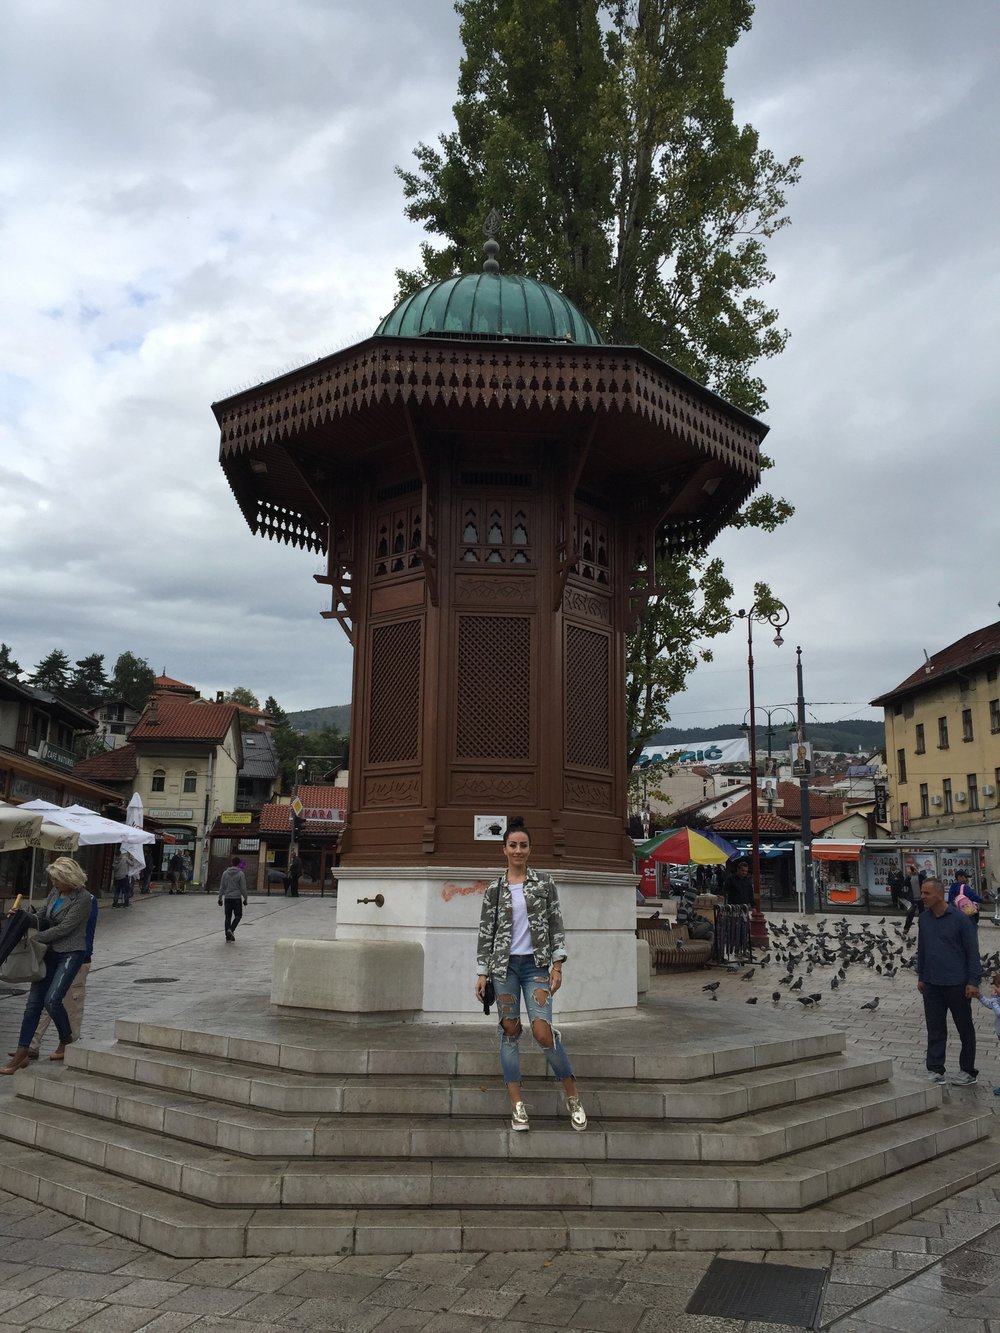 sarajevo-bosnia-streetstyle-ootd-style-fashion-blogger-fblogger